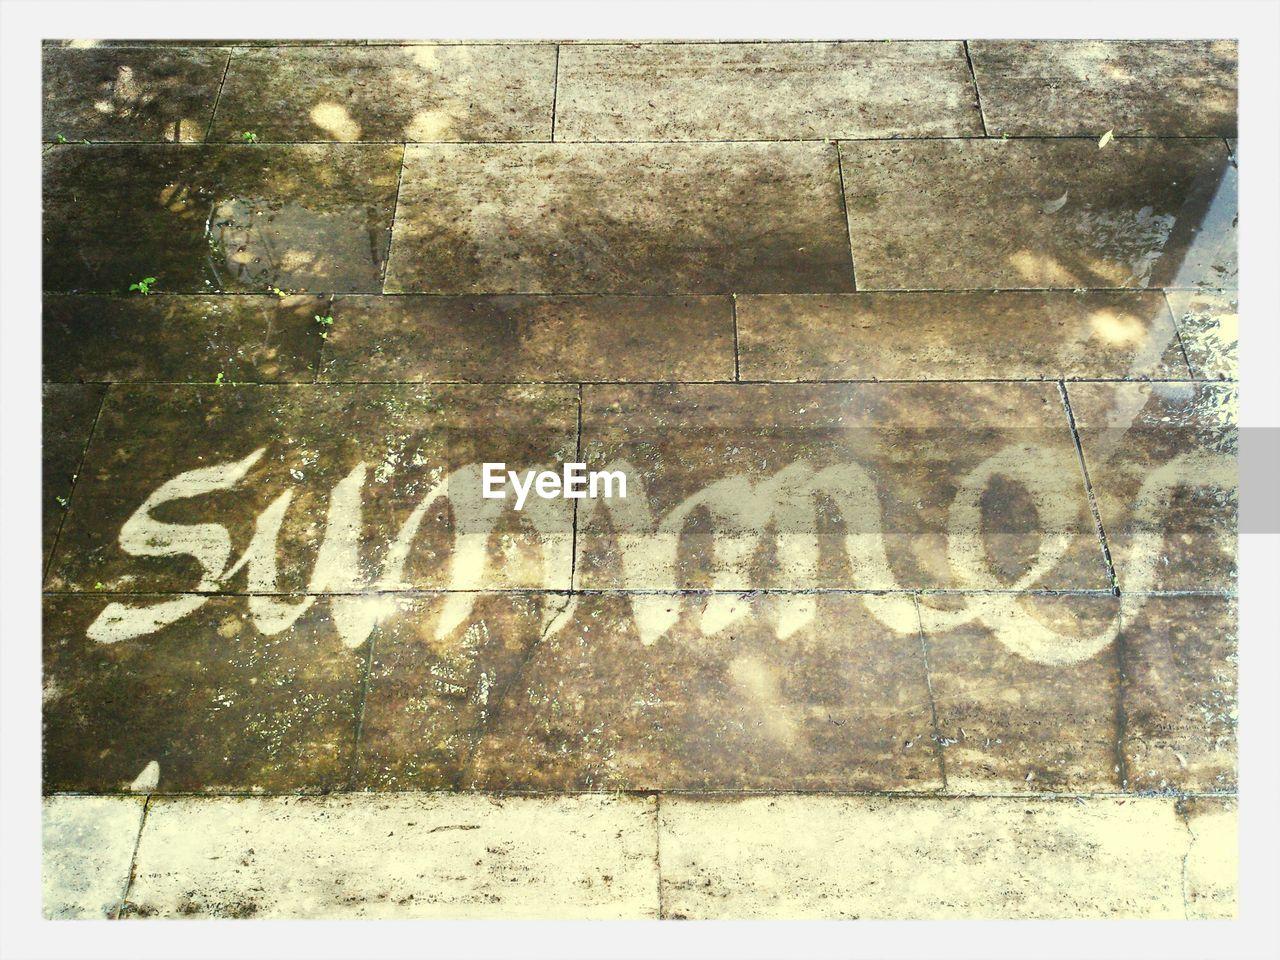 The word summer written on the ground